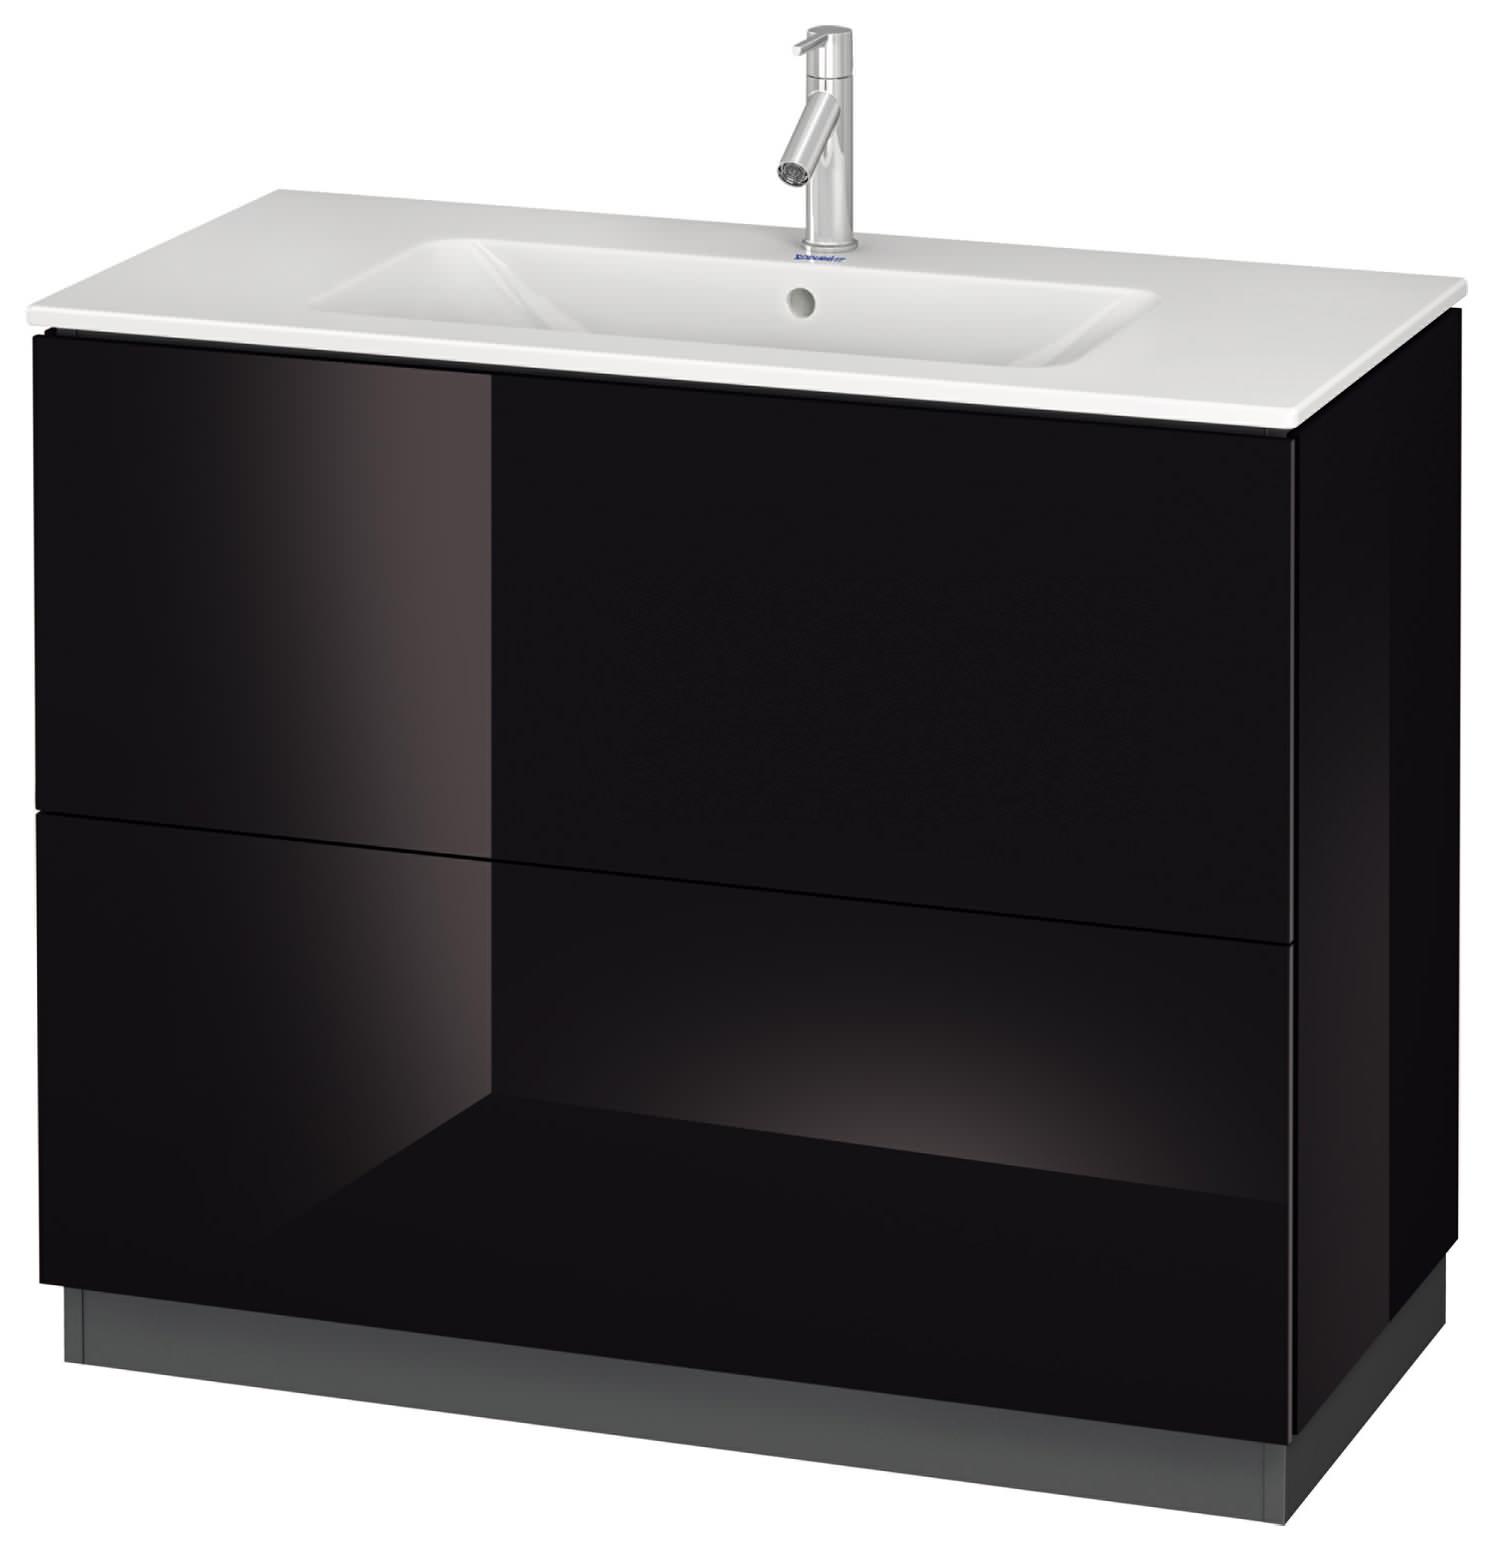 duravit l cube 1020mm vanity unit with me by starck basin. Black Bedroom Furniture Sets. Home Design Ideas